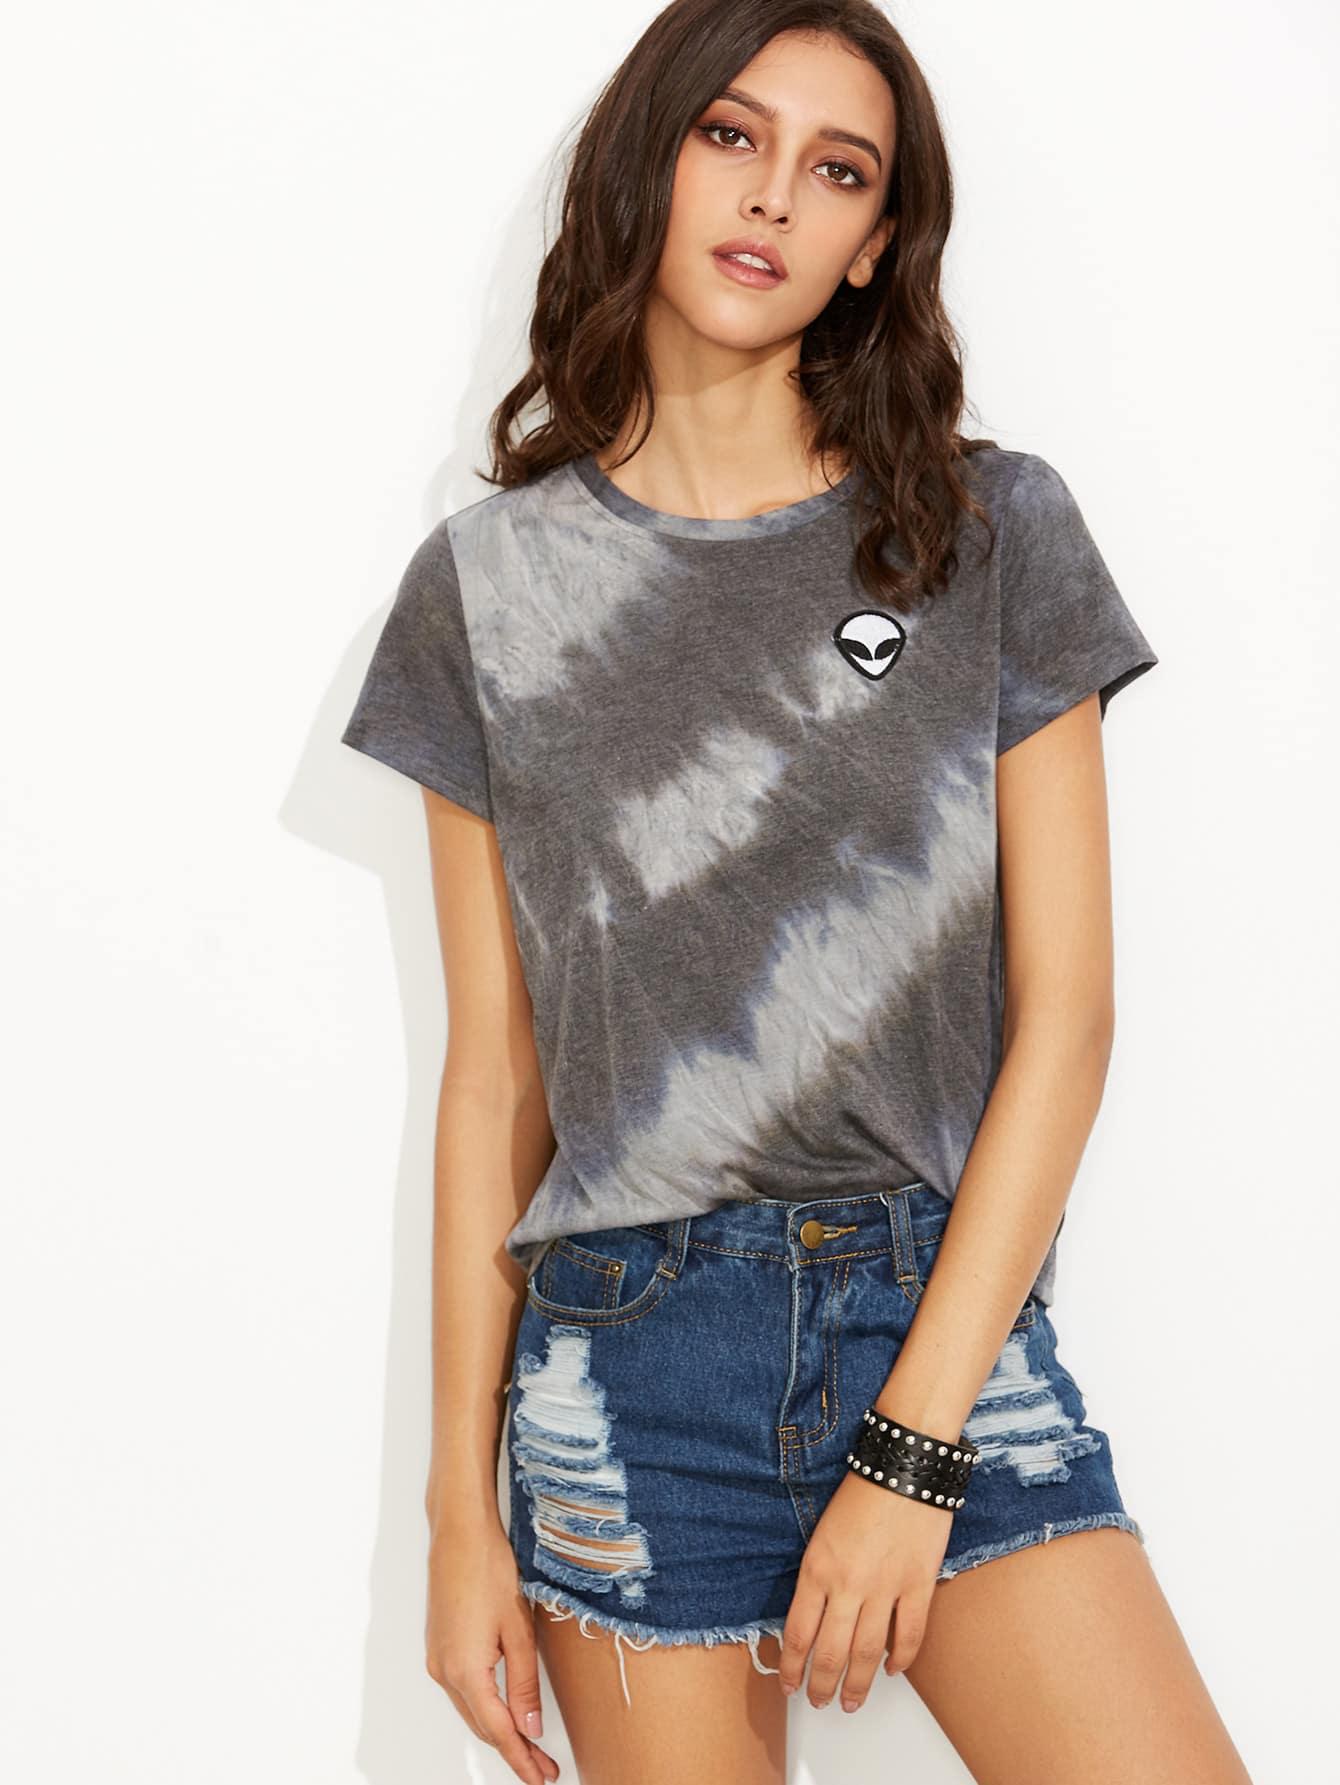 Tie Dye Print Alien Patch T-shirt turndown collar tie dye ink painting print shirt